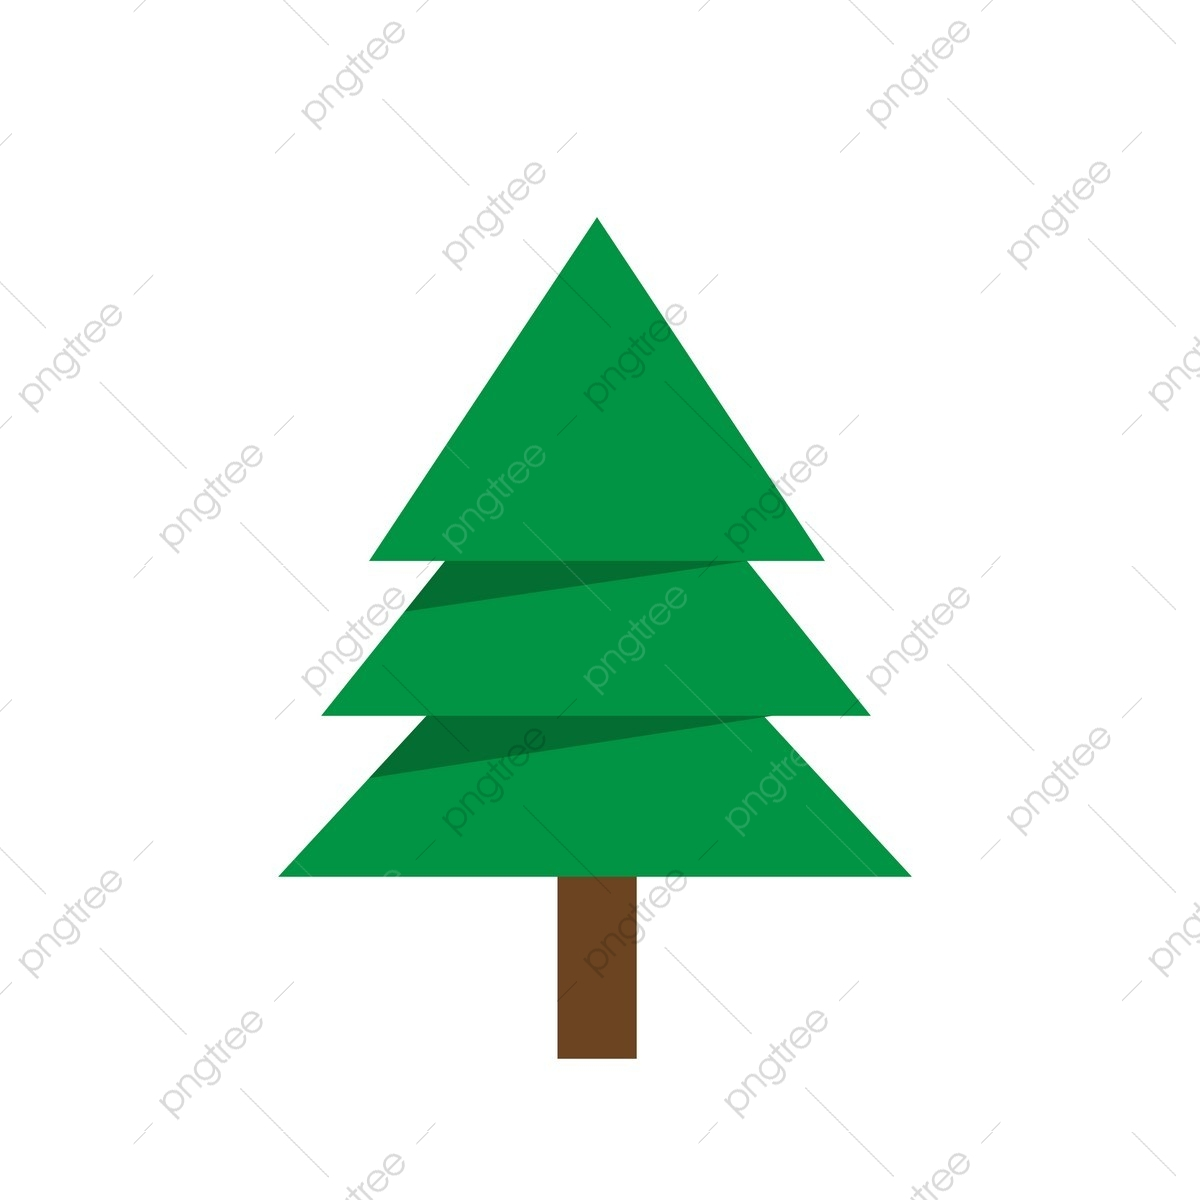 Symbol Weihnachtsbaum.Weihnachtsbaum Symbol Weihnachten Icon Vektor Png Und Vektor Zum